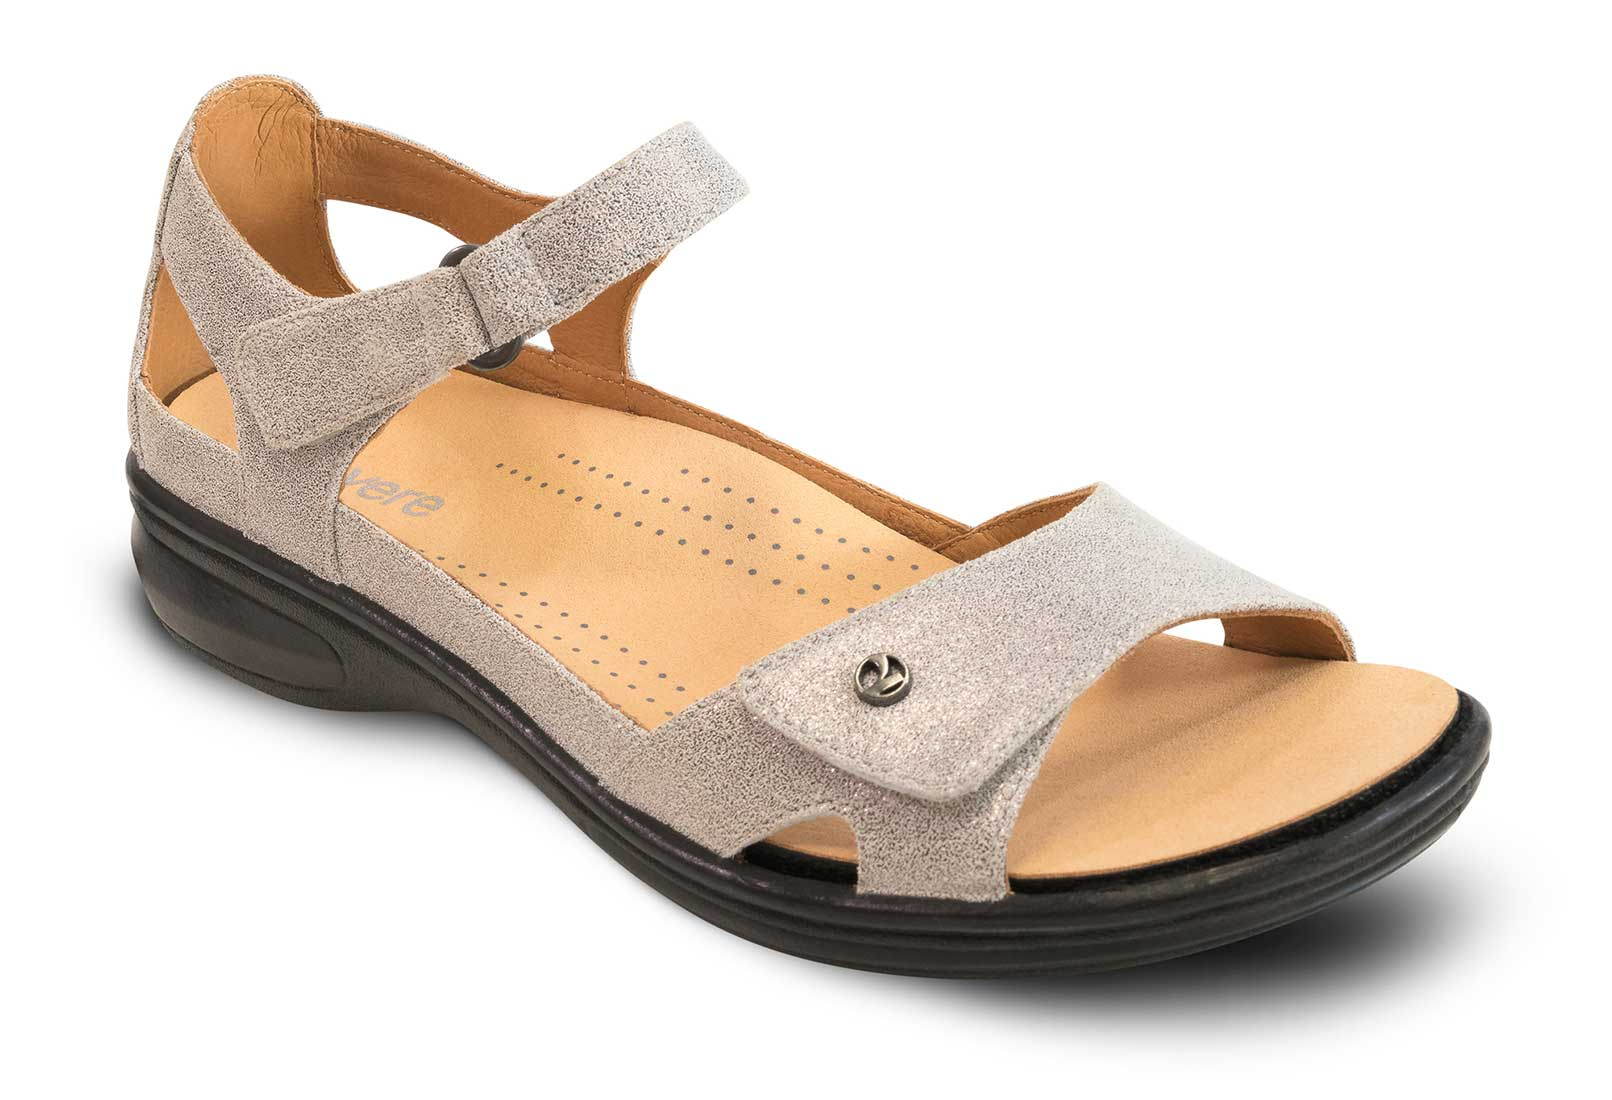 Bay Heeled Sandal with Adjustable Straps   Drew Shoe